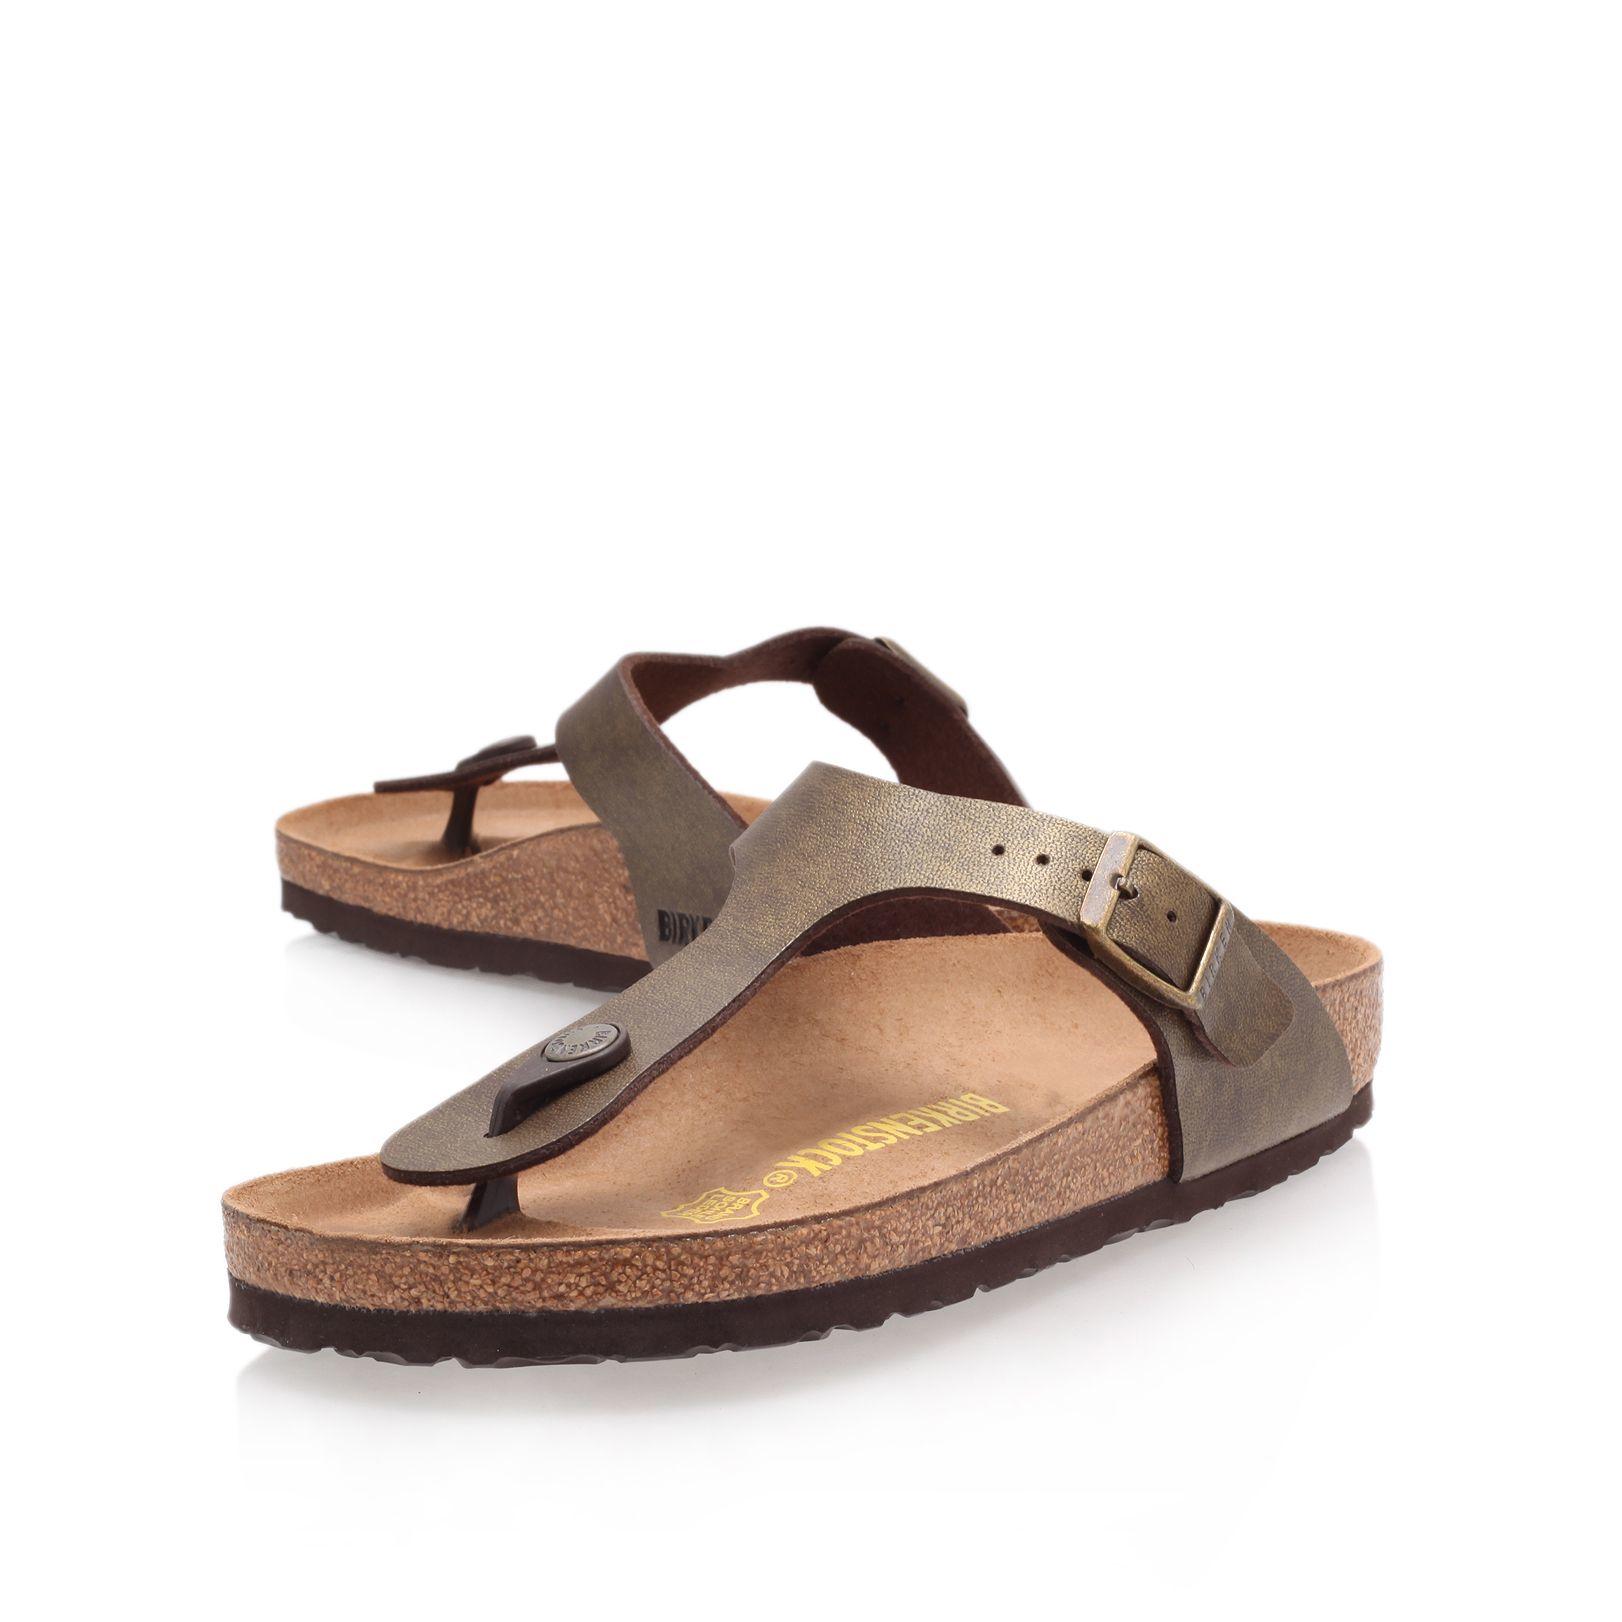 birkenstock gizeh sandals in metallic lyst. Black Bedroom Furniture Sets. Home Design Ideas